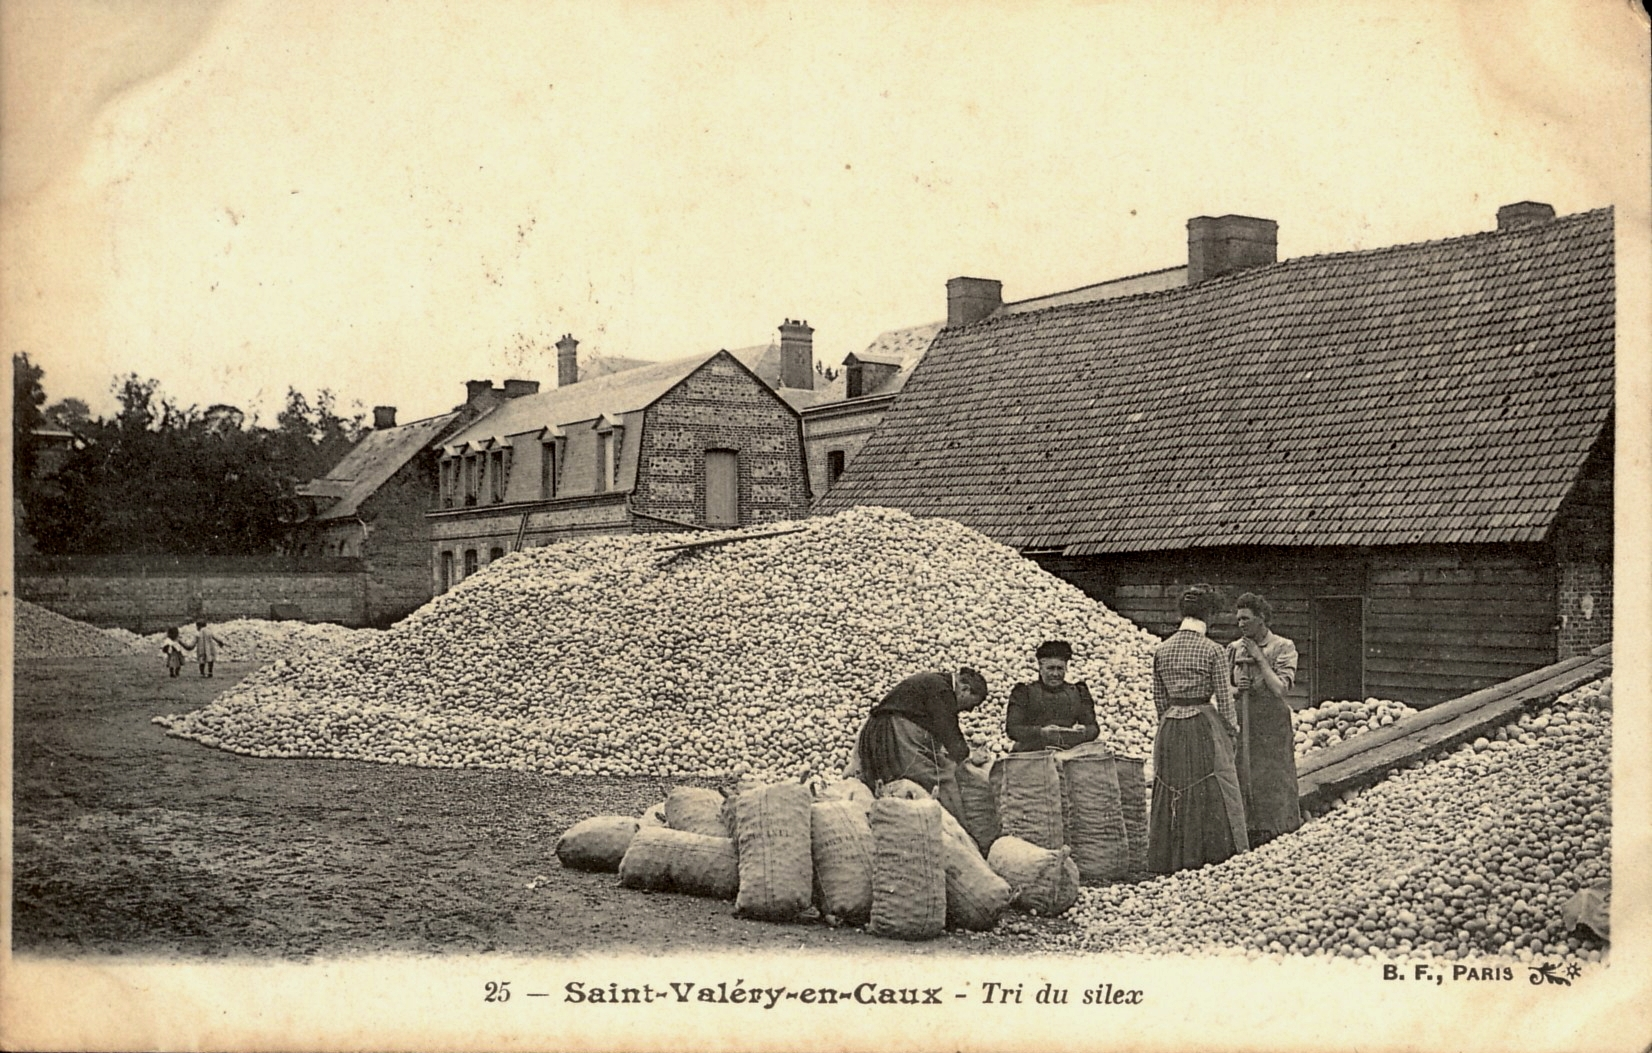 Saint Valery en Caux - Tri du silex (sorting flints) early 1900s